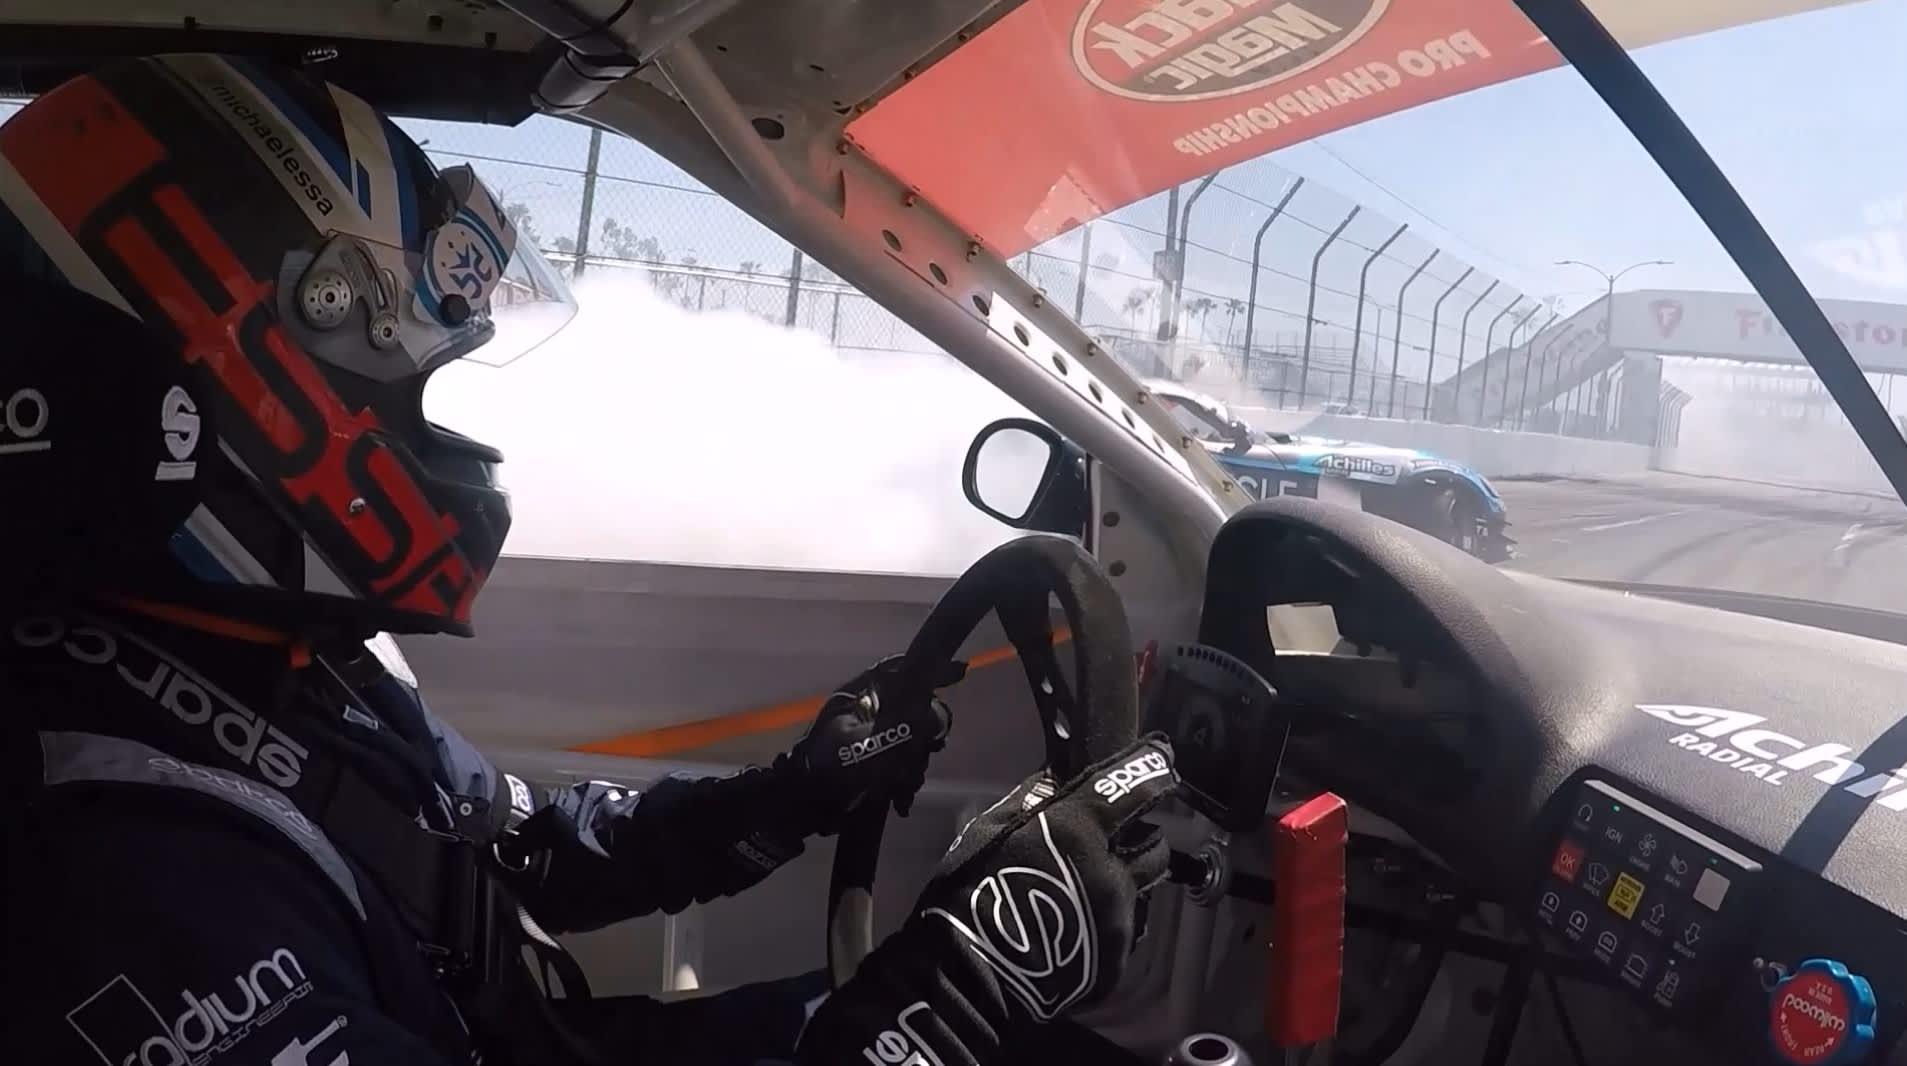 Watch: Riding shotgun in a Formula Drift race car